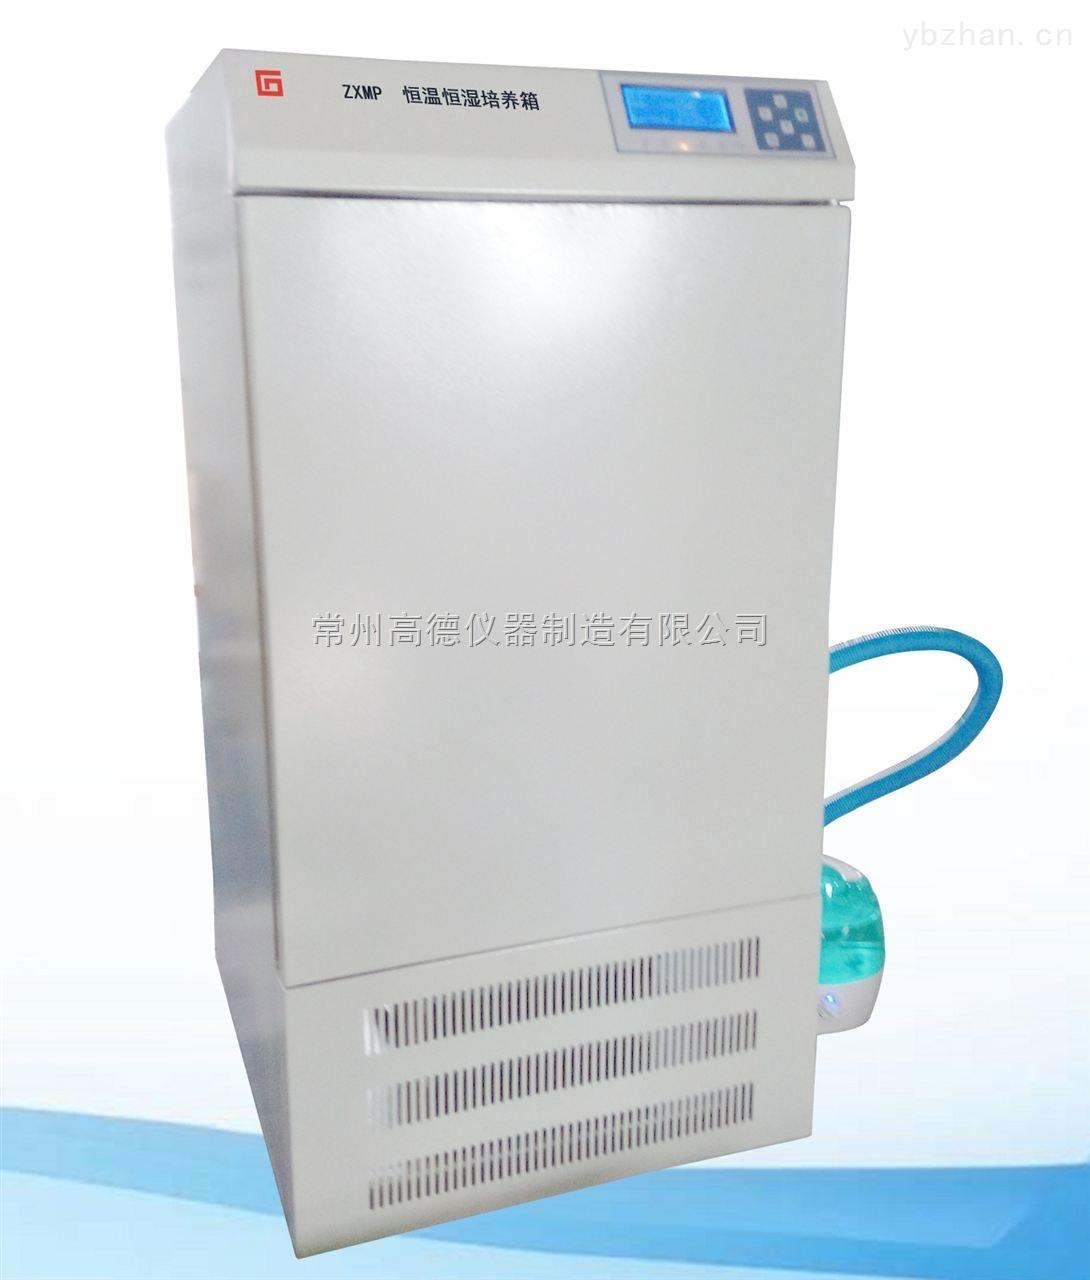 ZXMP-A250-恒温恒湿培养箱